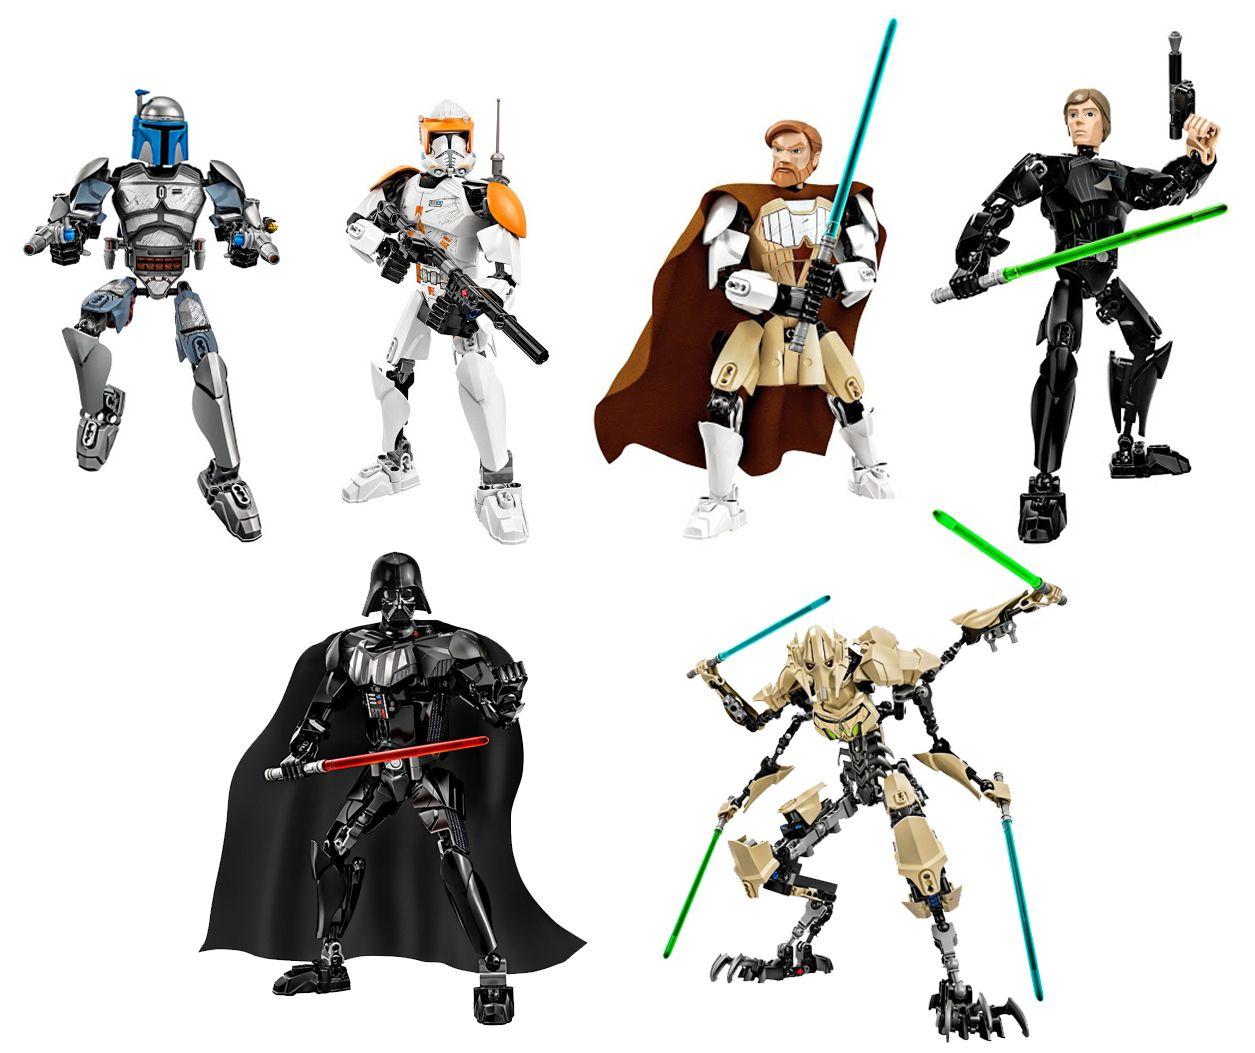 lego star wars buildable action figures present day. Black Bedroom Furniture Sets. Home Design Ideas